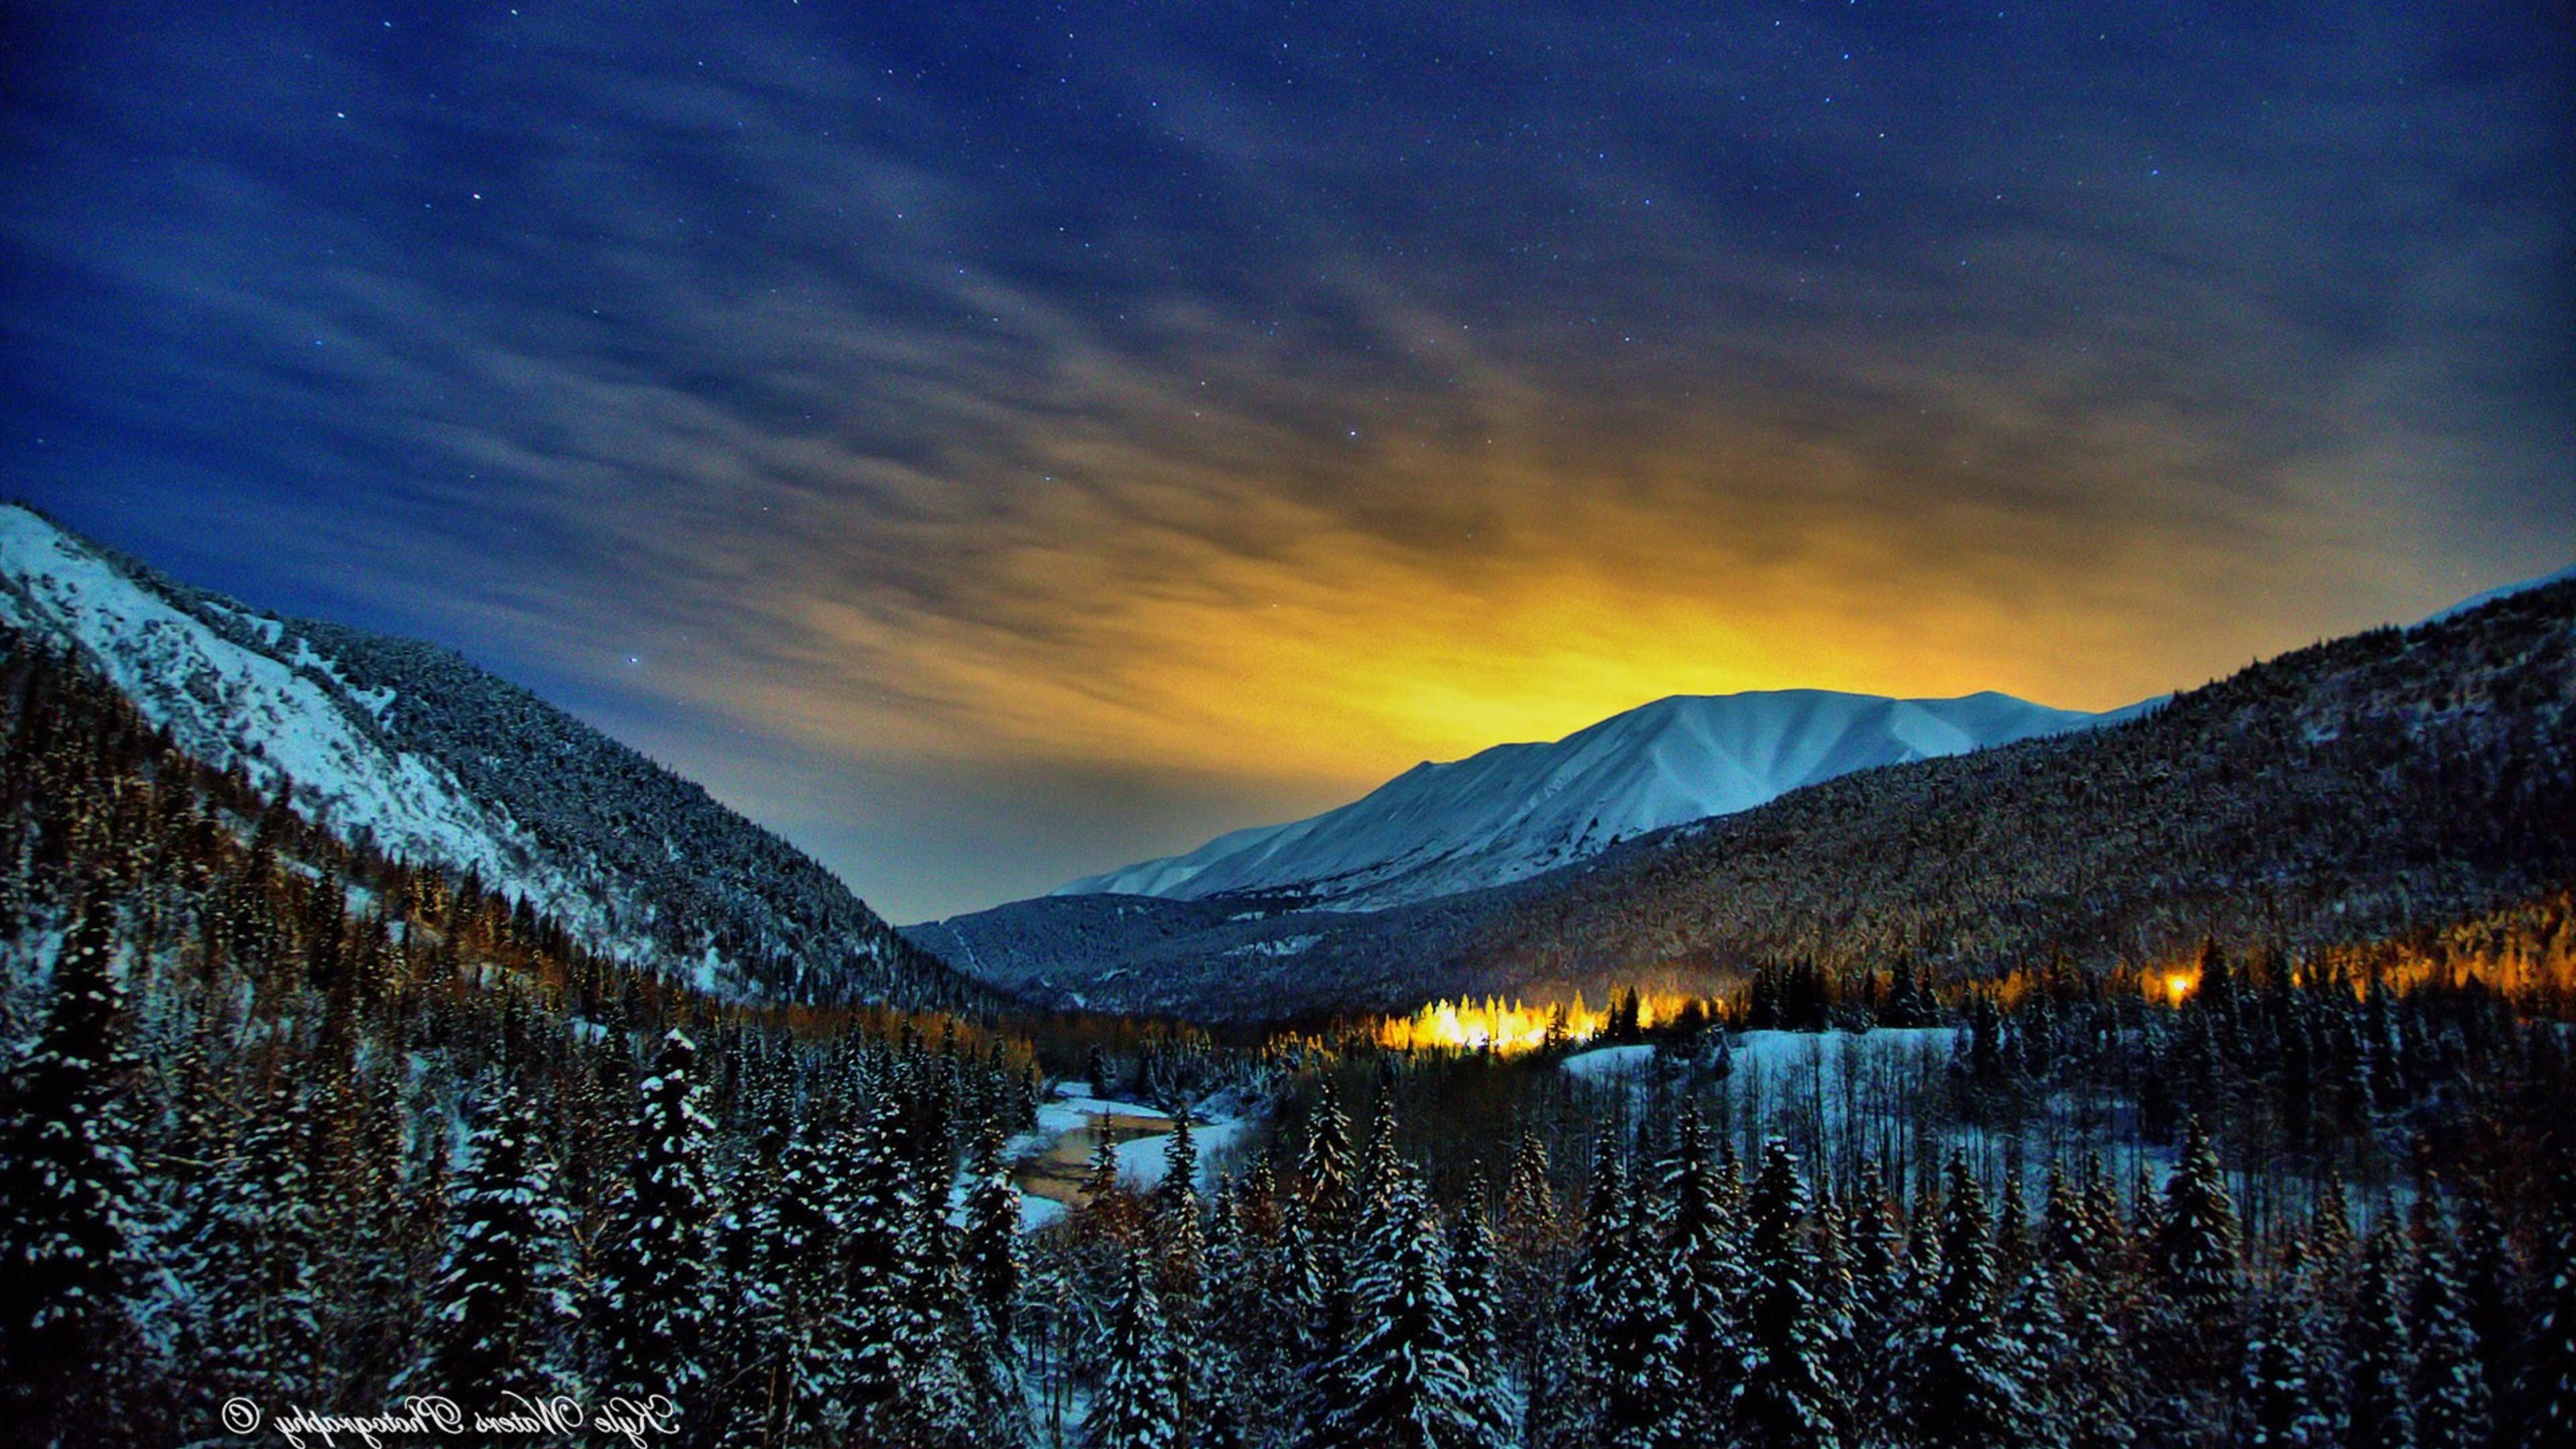 Alaska Winter Nights HD Nature 4k Wallpapers Images Backgrounds